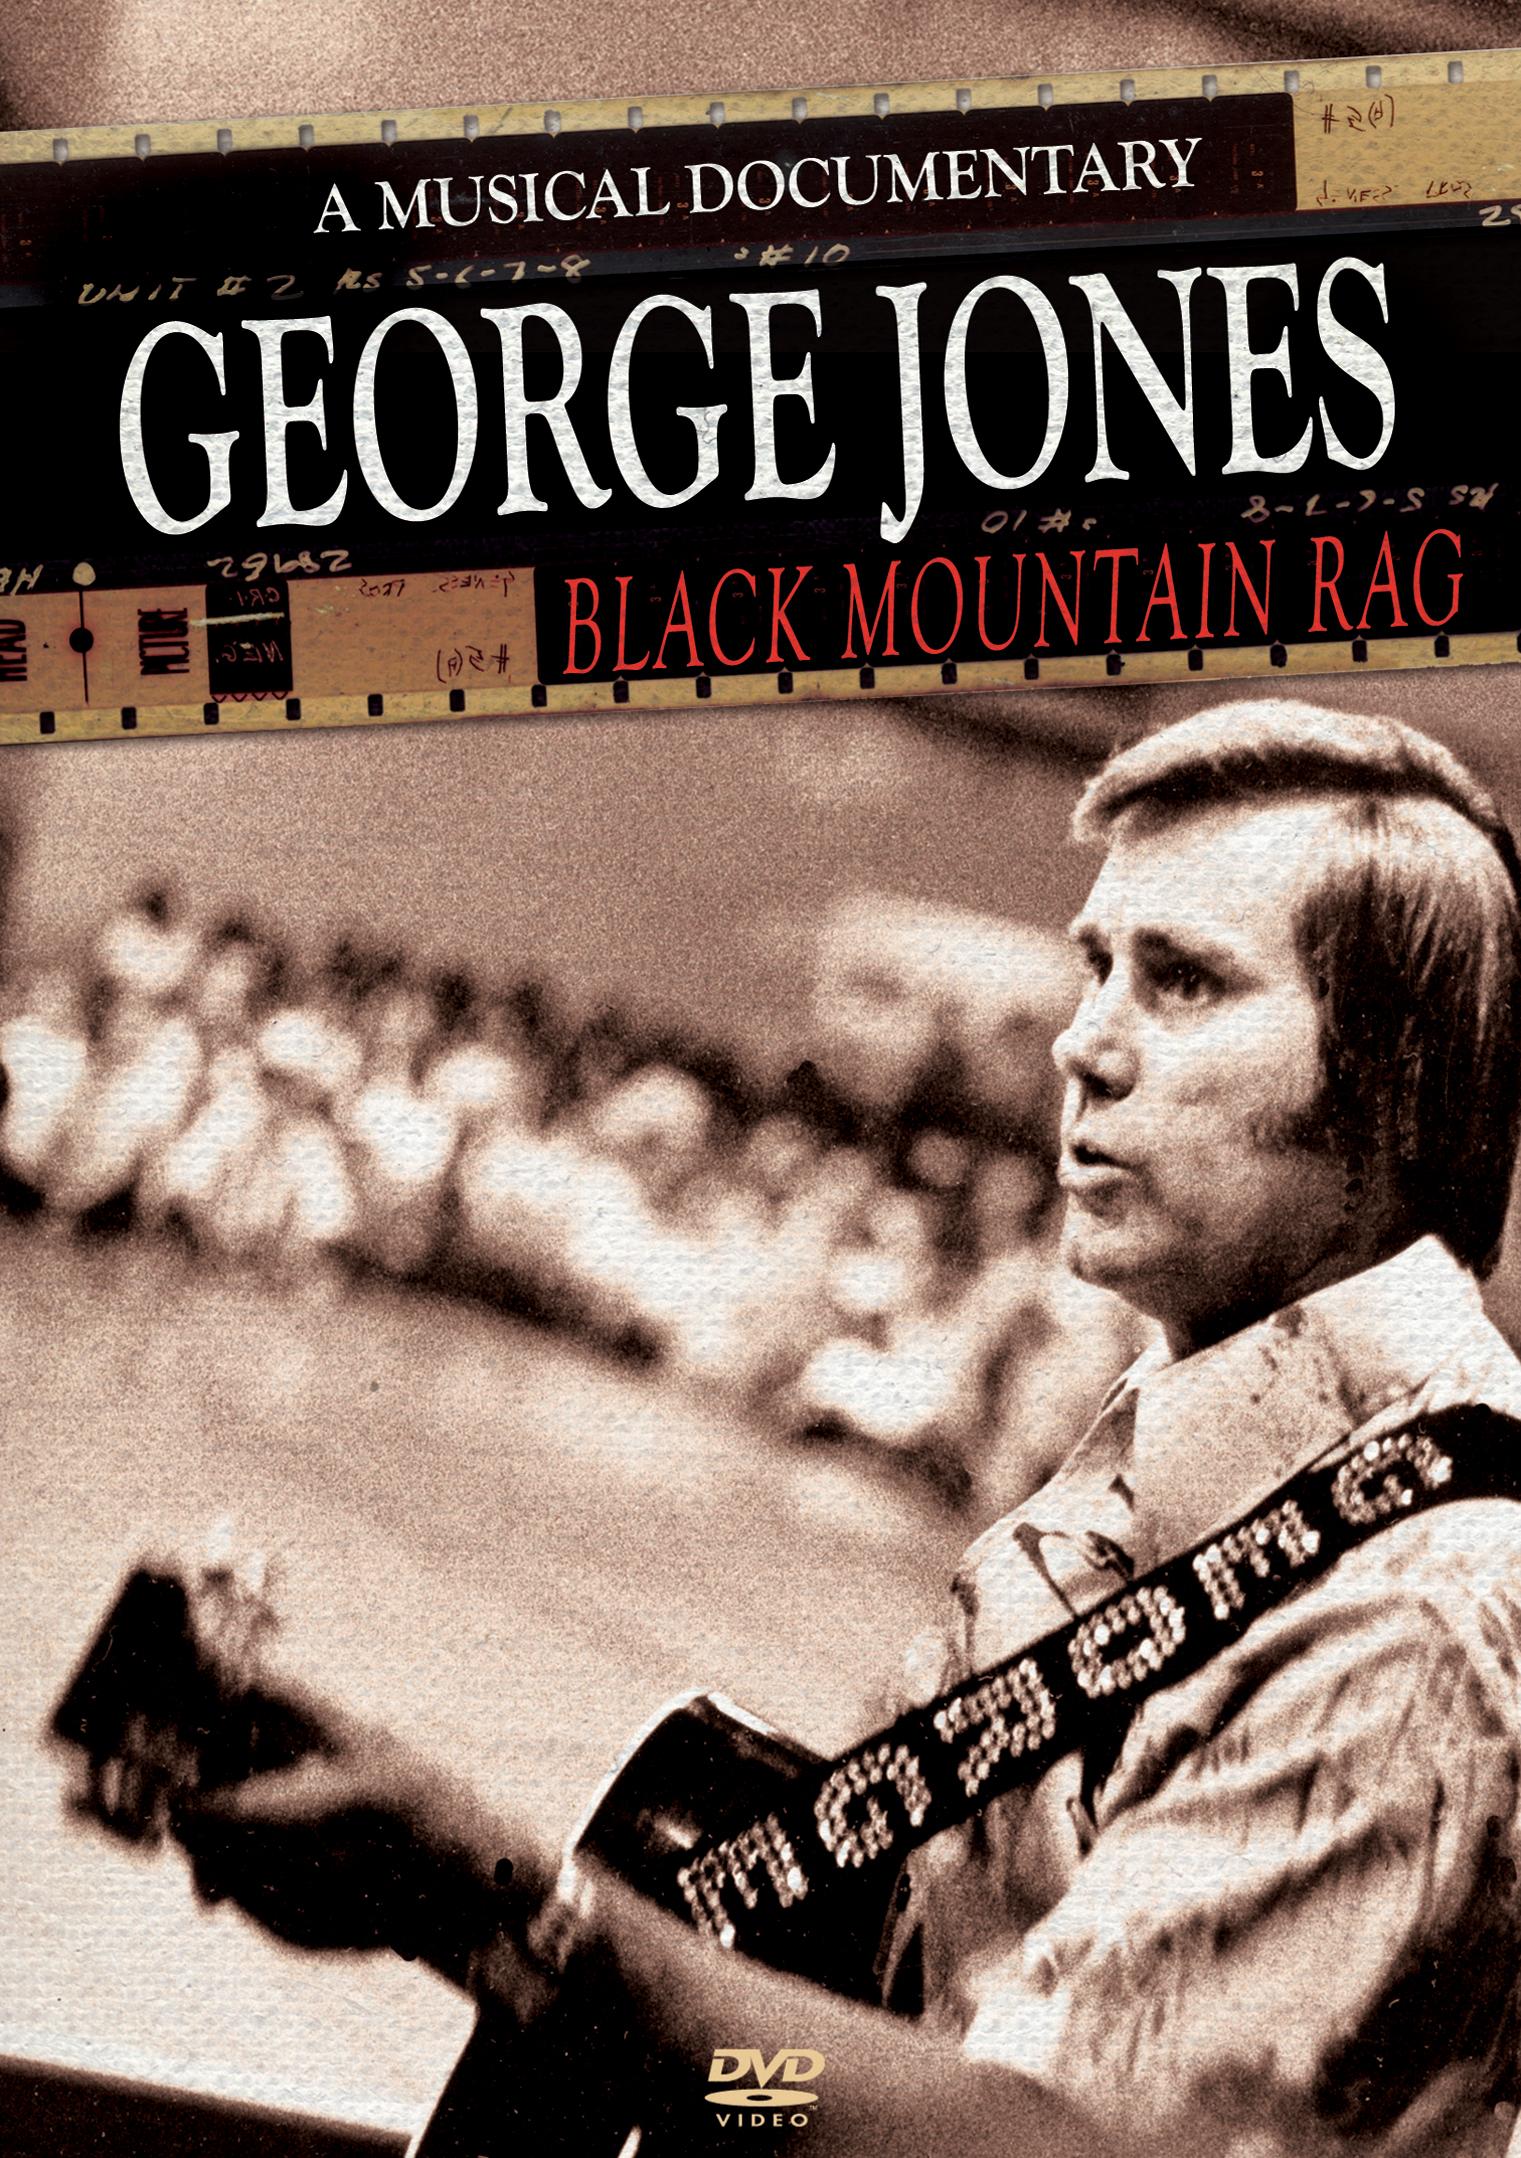 George Jones: Black Mountain Rag